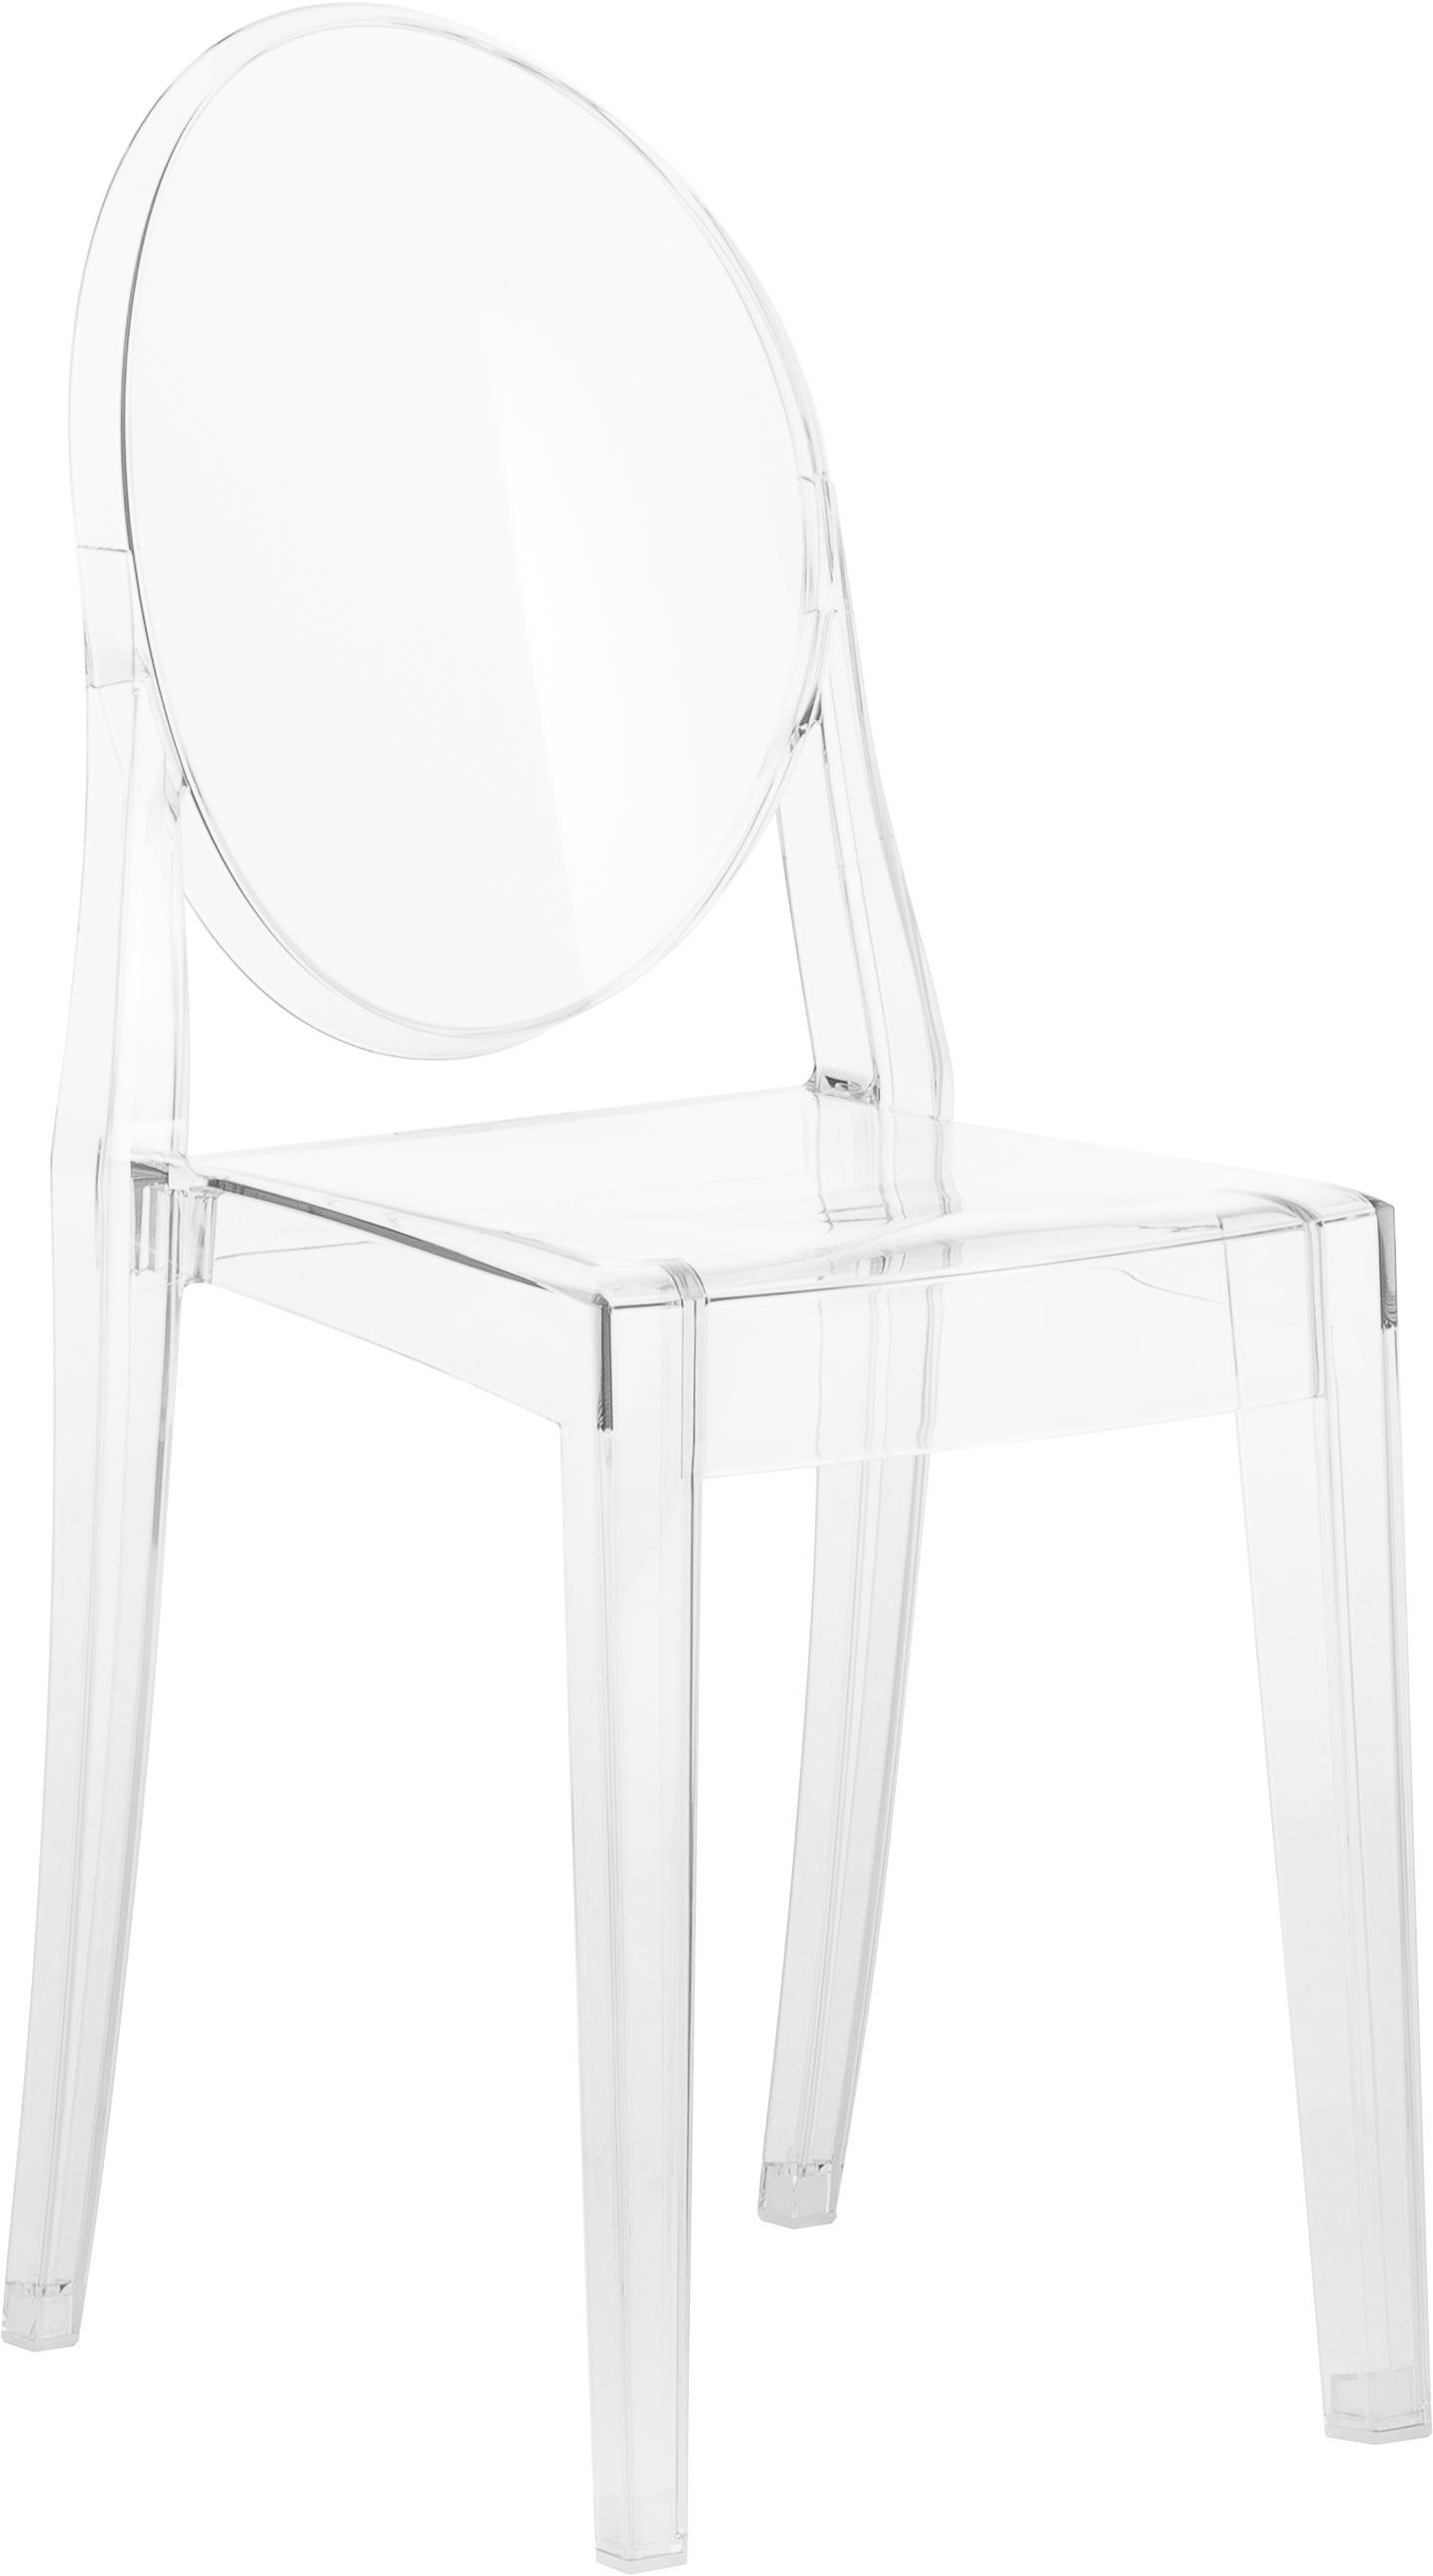 Stoel Victoria Ghost, Polycarbonaat, Transparant, 38 x 89 cm